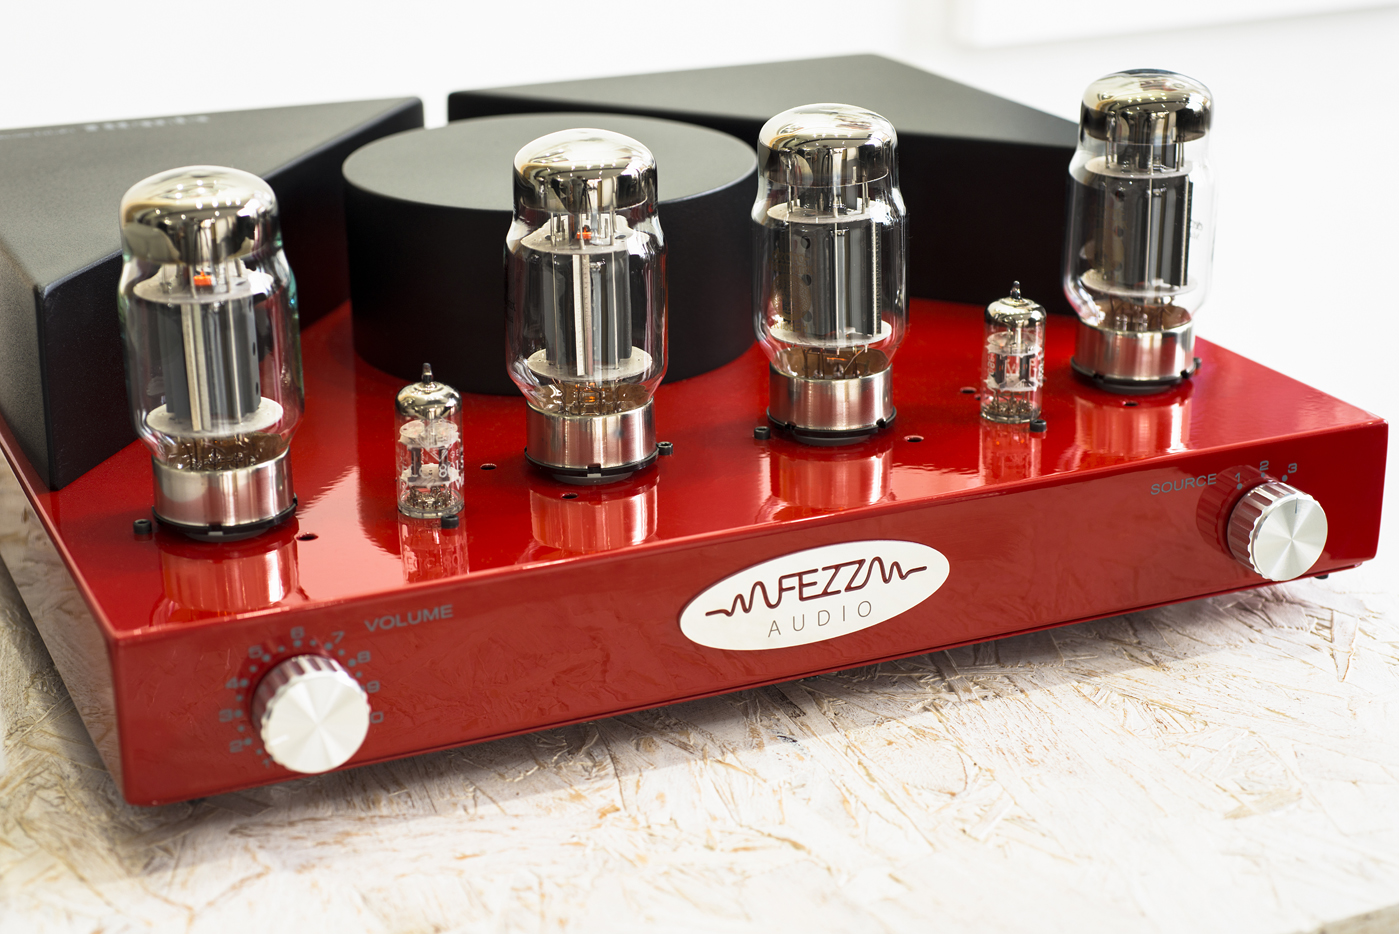 fezz-titania-valve-amplifier-001.jpg